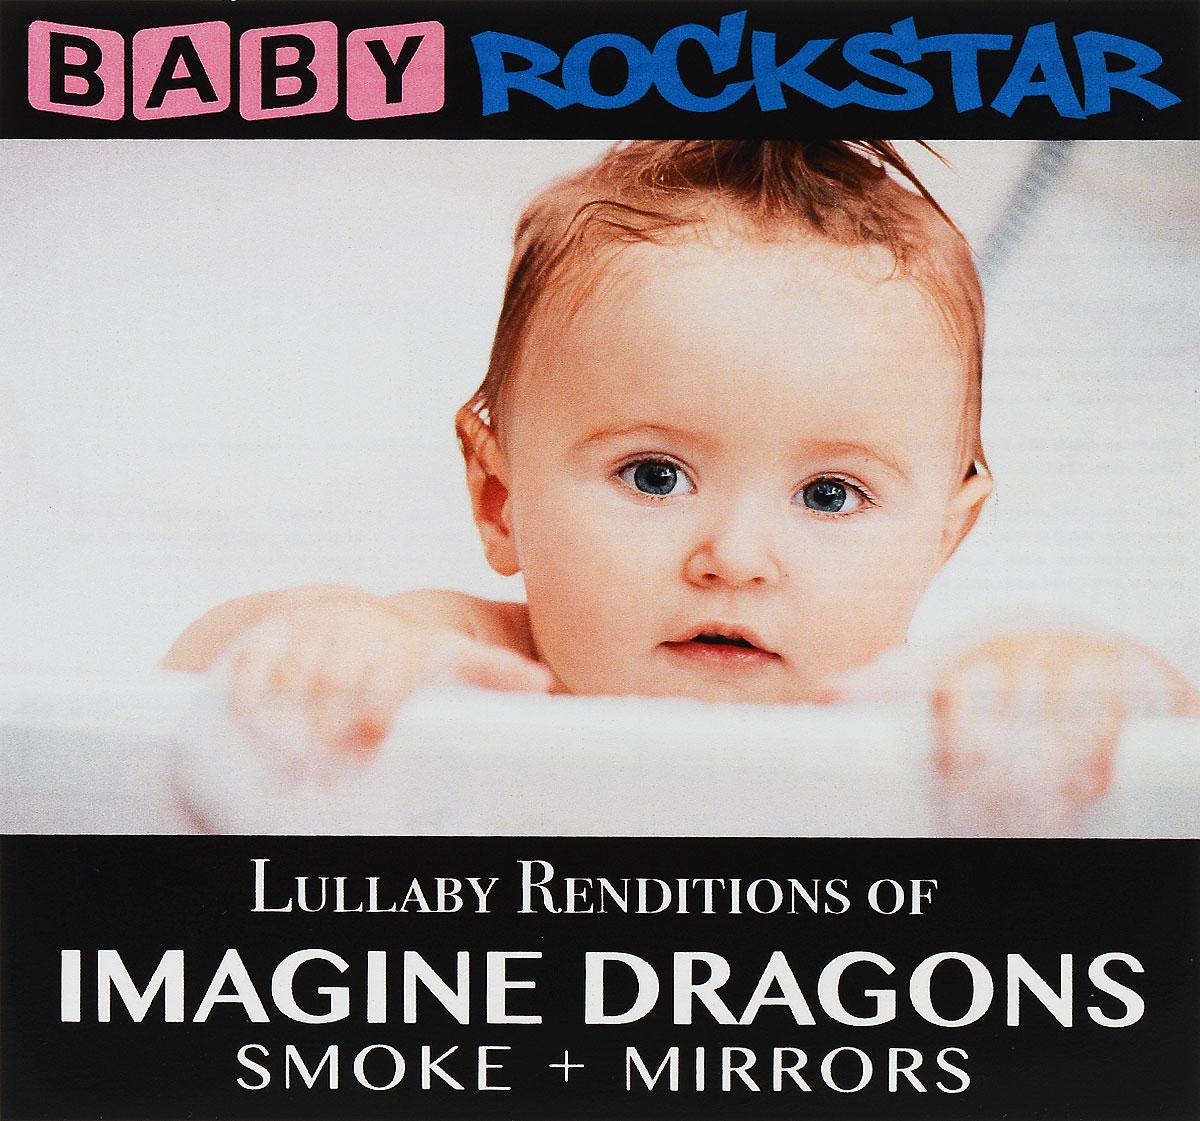 Baby Rockstar Baby Rockstar. Lullaby Renditions Of Imagine Dragons - Smoke + Mirrors bw cmos onvif hd 720p wireless wifi security camera p2p baby monitor ip cctv accessory smoke detector buzzer gsm alarm system